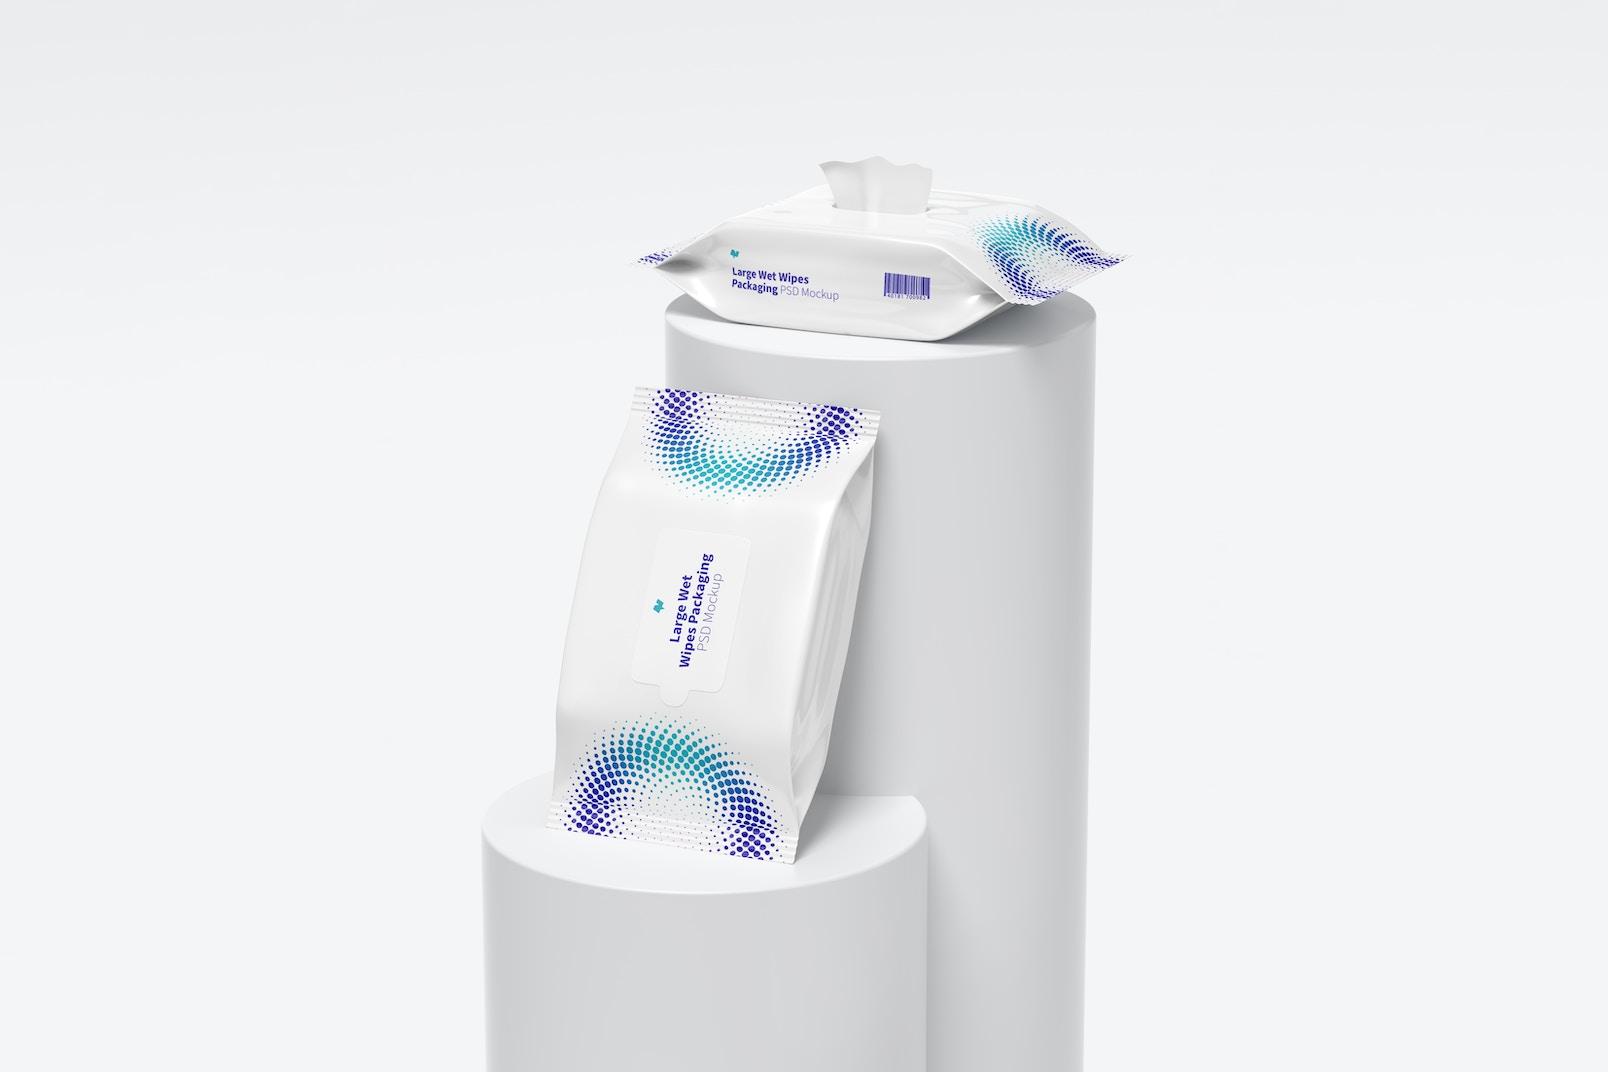 Large Wet Wipes Packaging Mockup